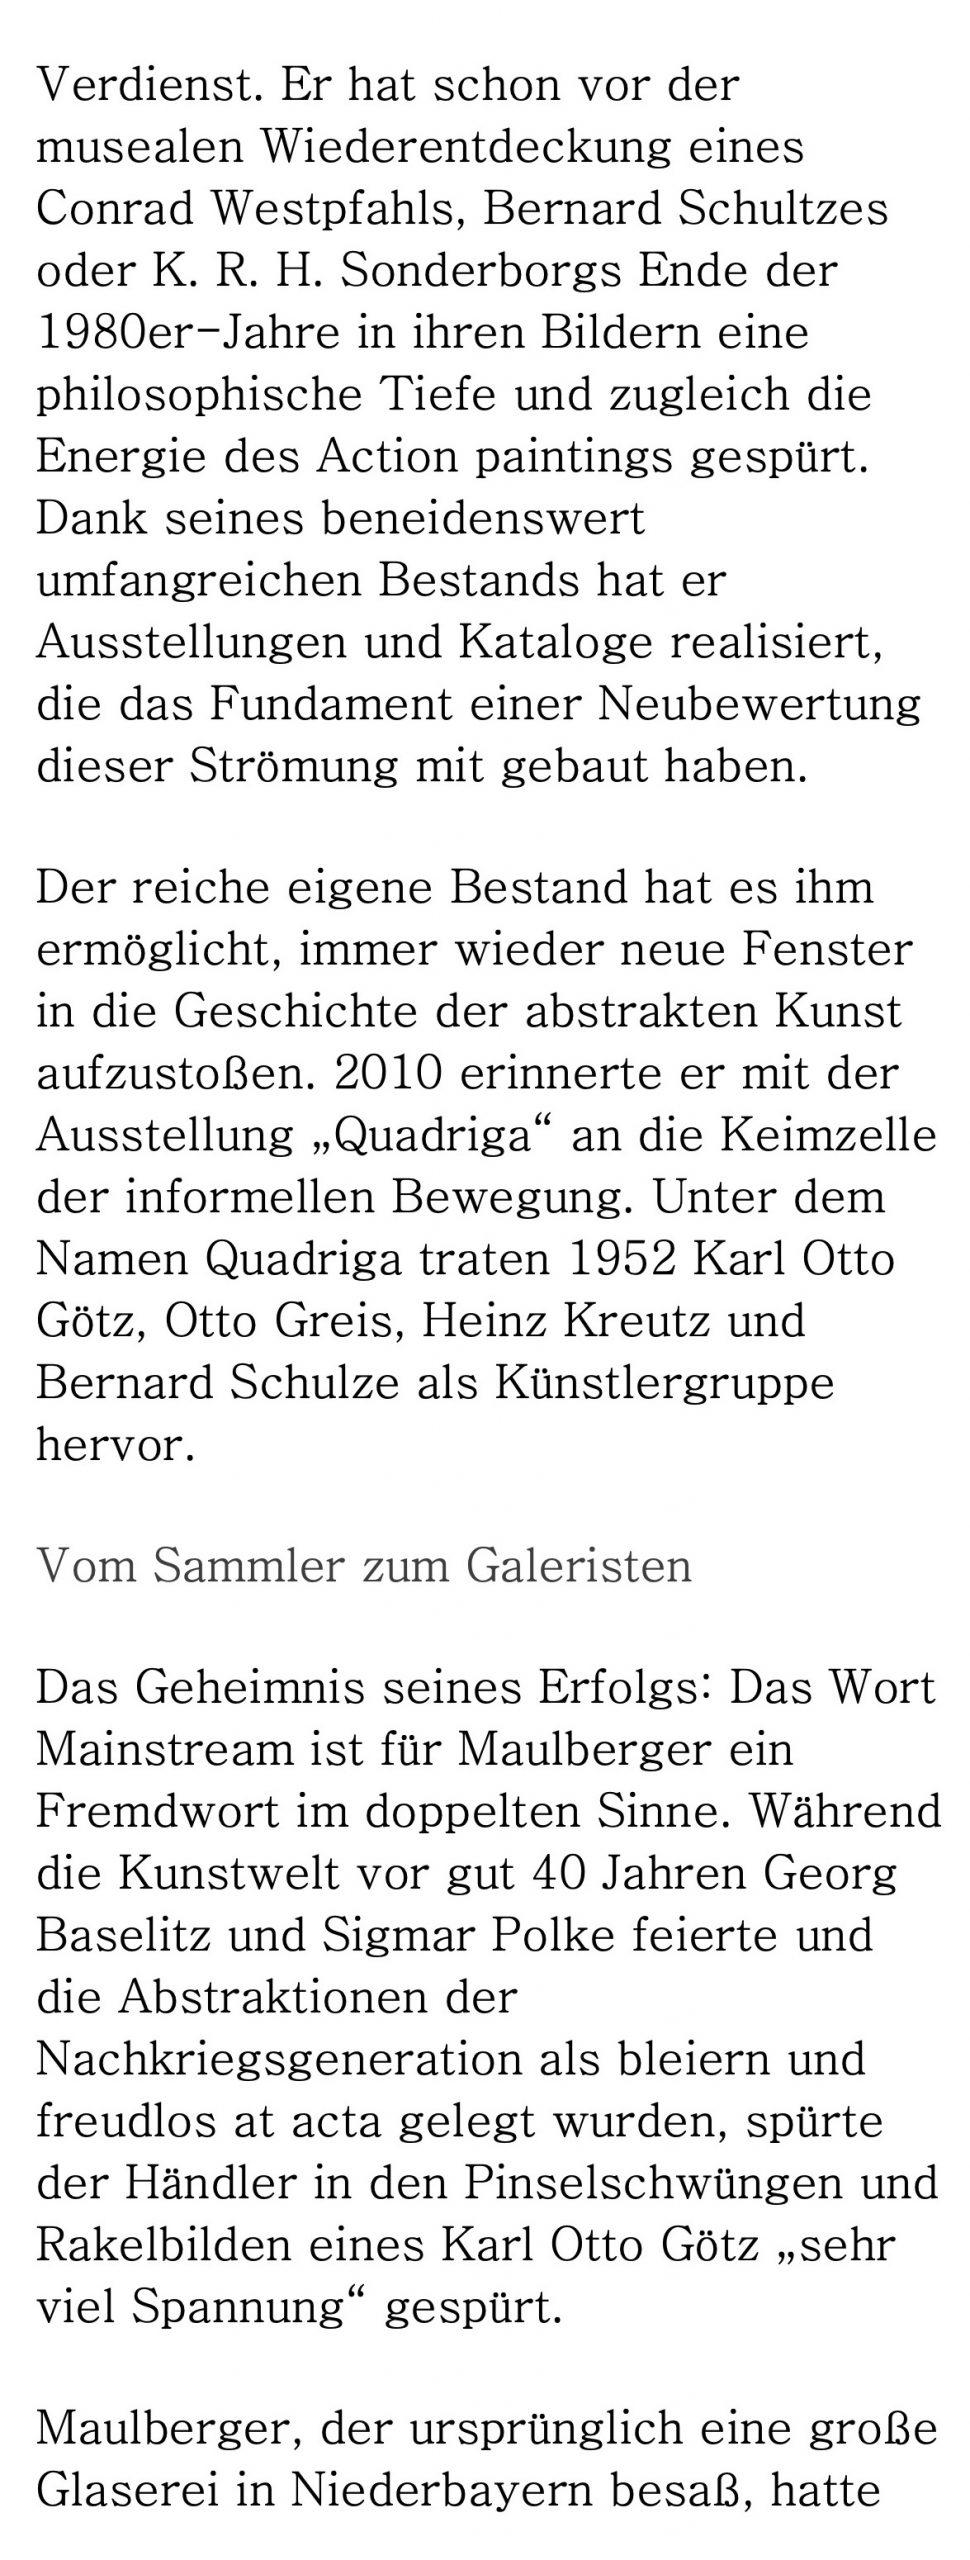 Presse Galerie Maulberger Handelsblatt 2014 03